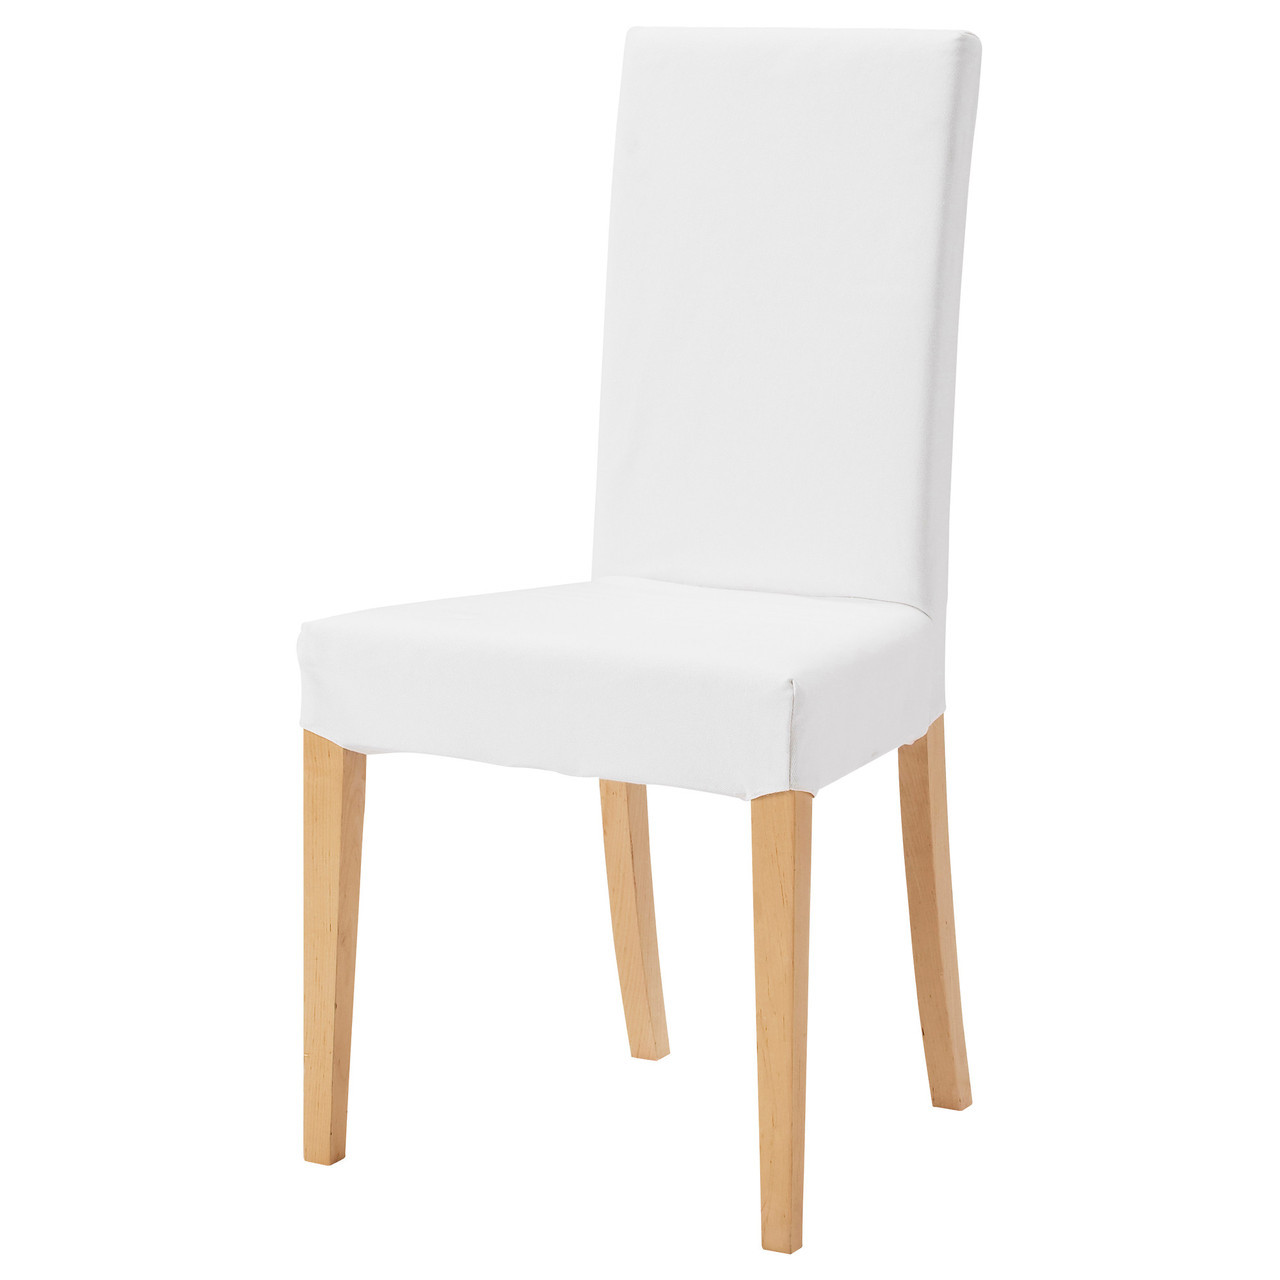 Кухонный стул HARRY